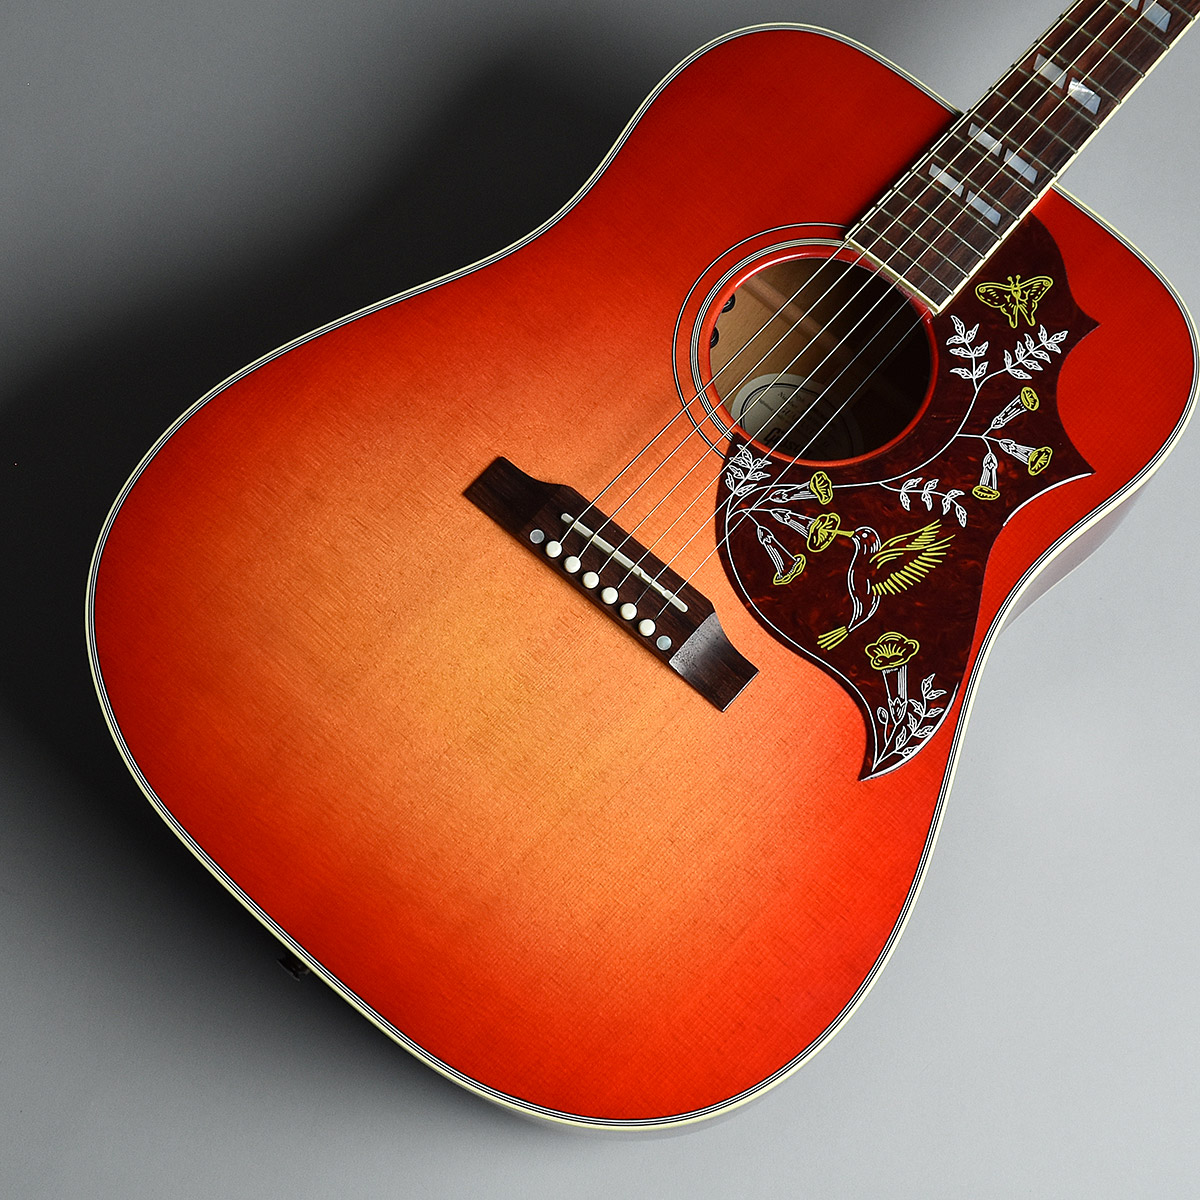 Gibson Hummingbird 2018 Heritage Burst S/N:13337055 エレアコ 【ギブソン】【未展示品】